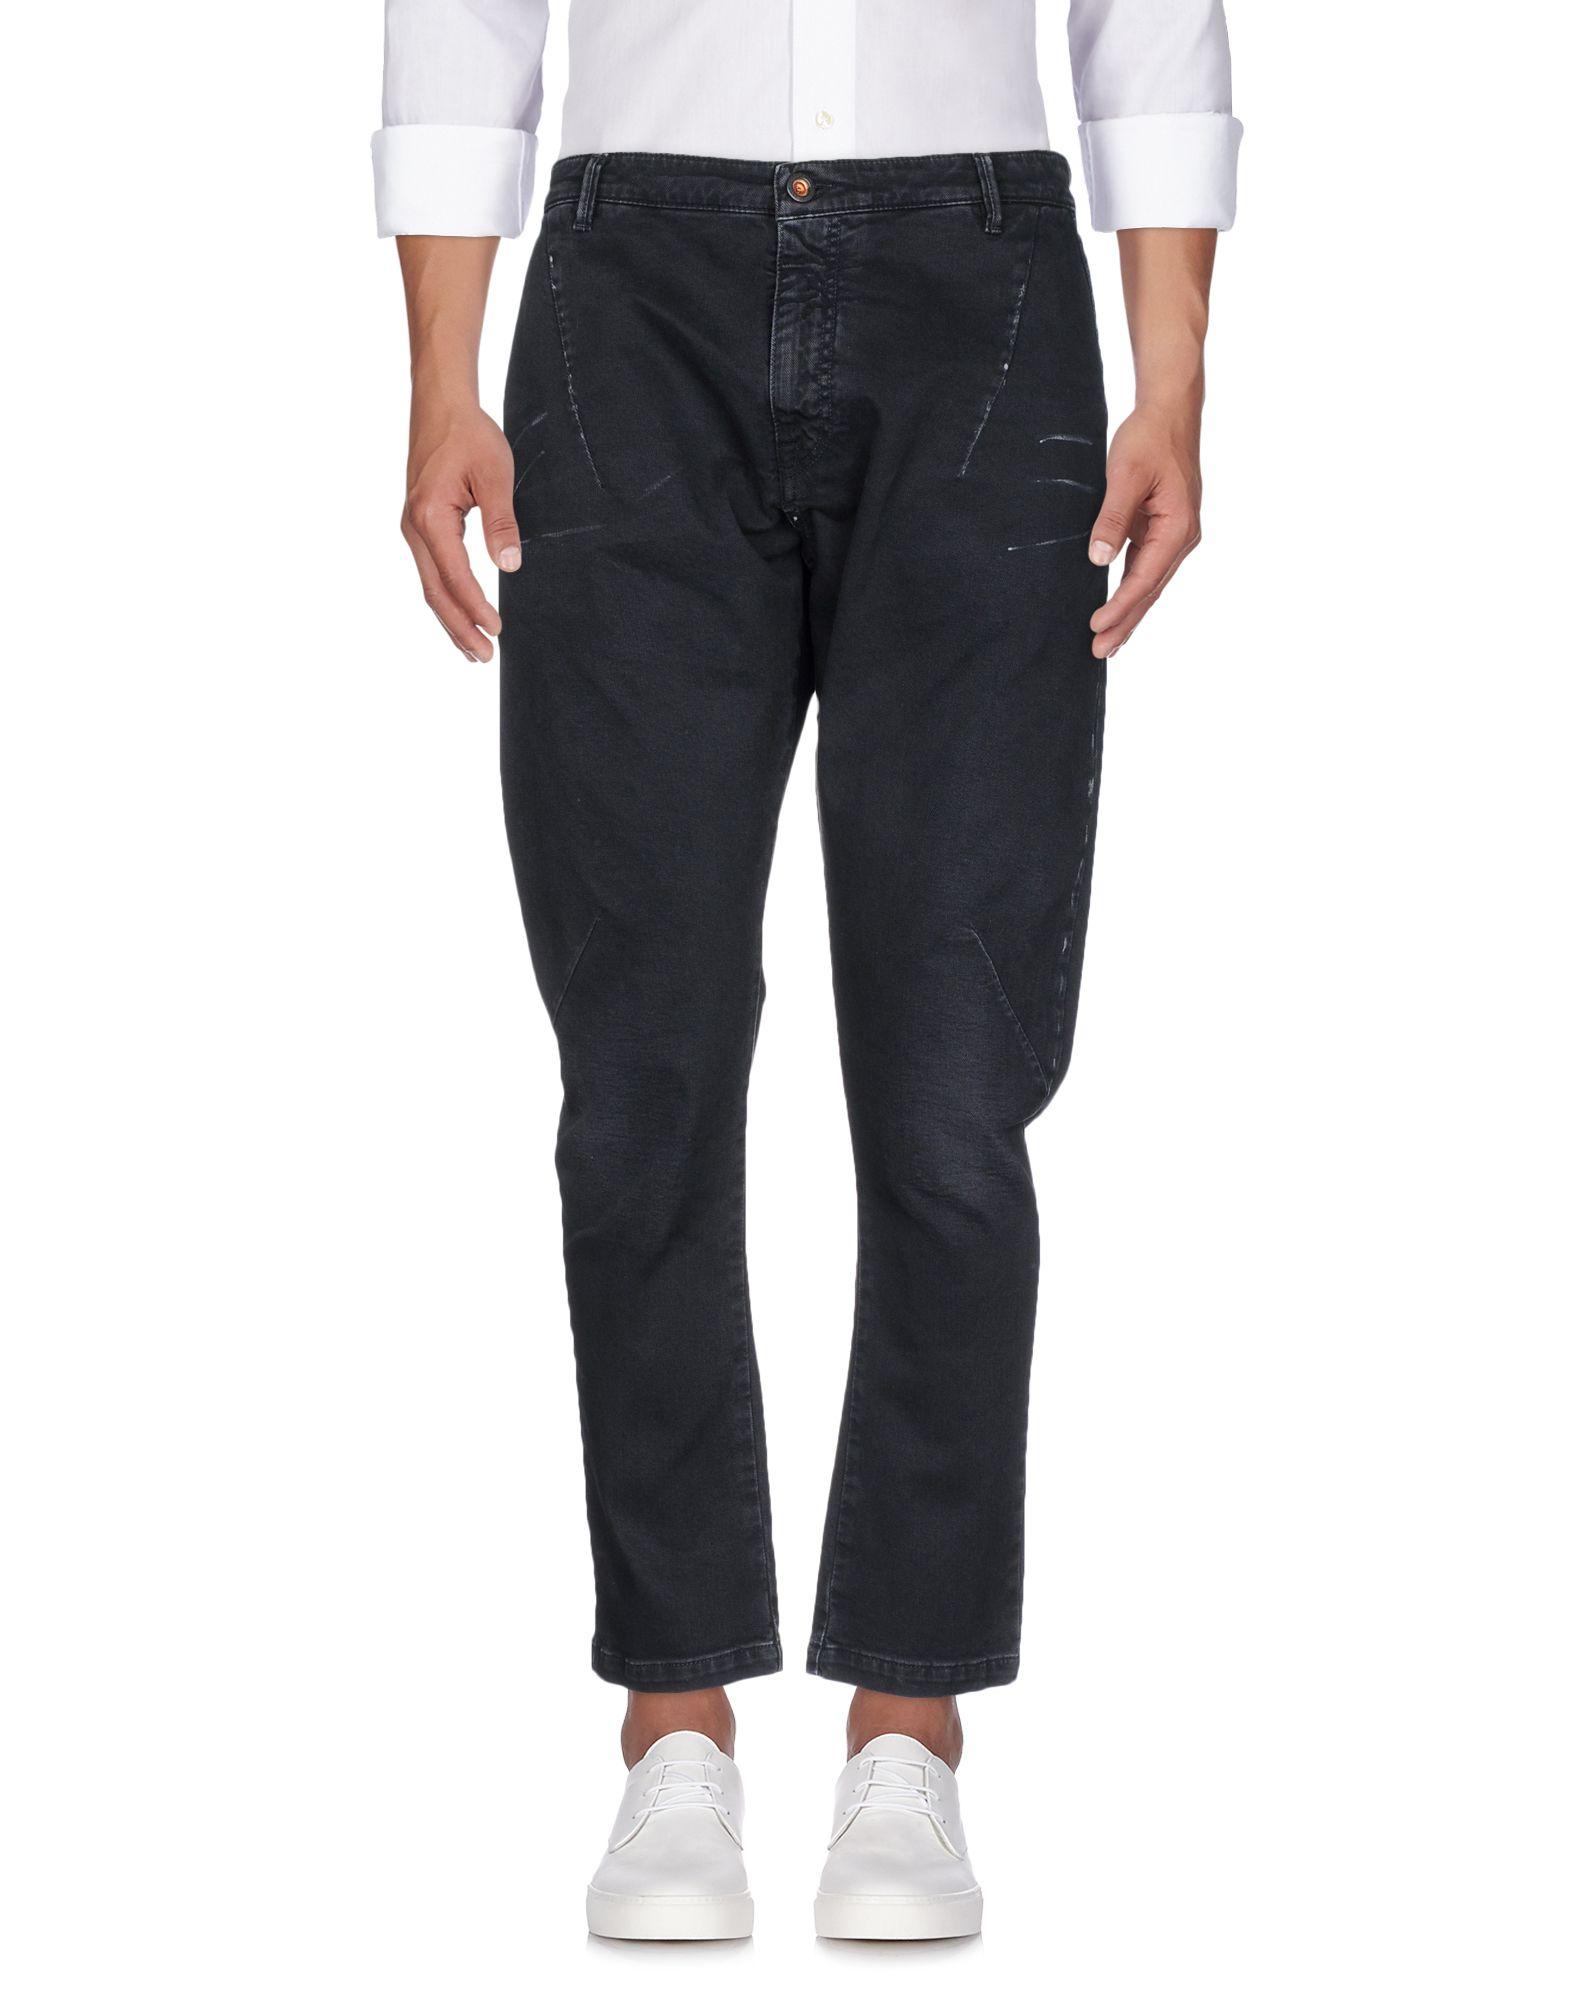 Pantaloni Jeans Jeans Jeans Berna Uomo - 42604786RX 8f1c42